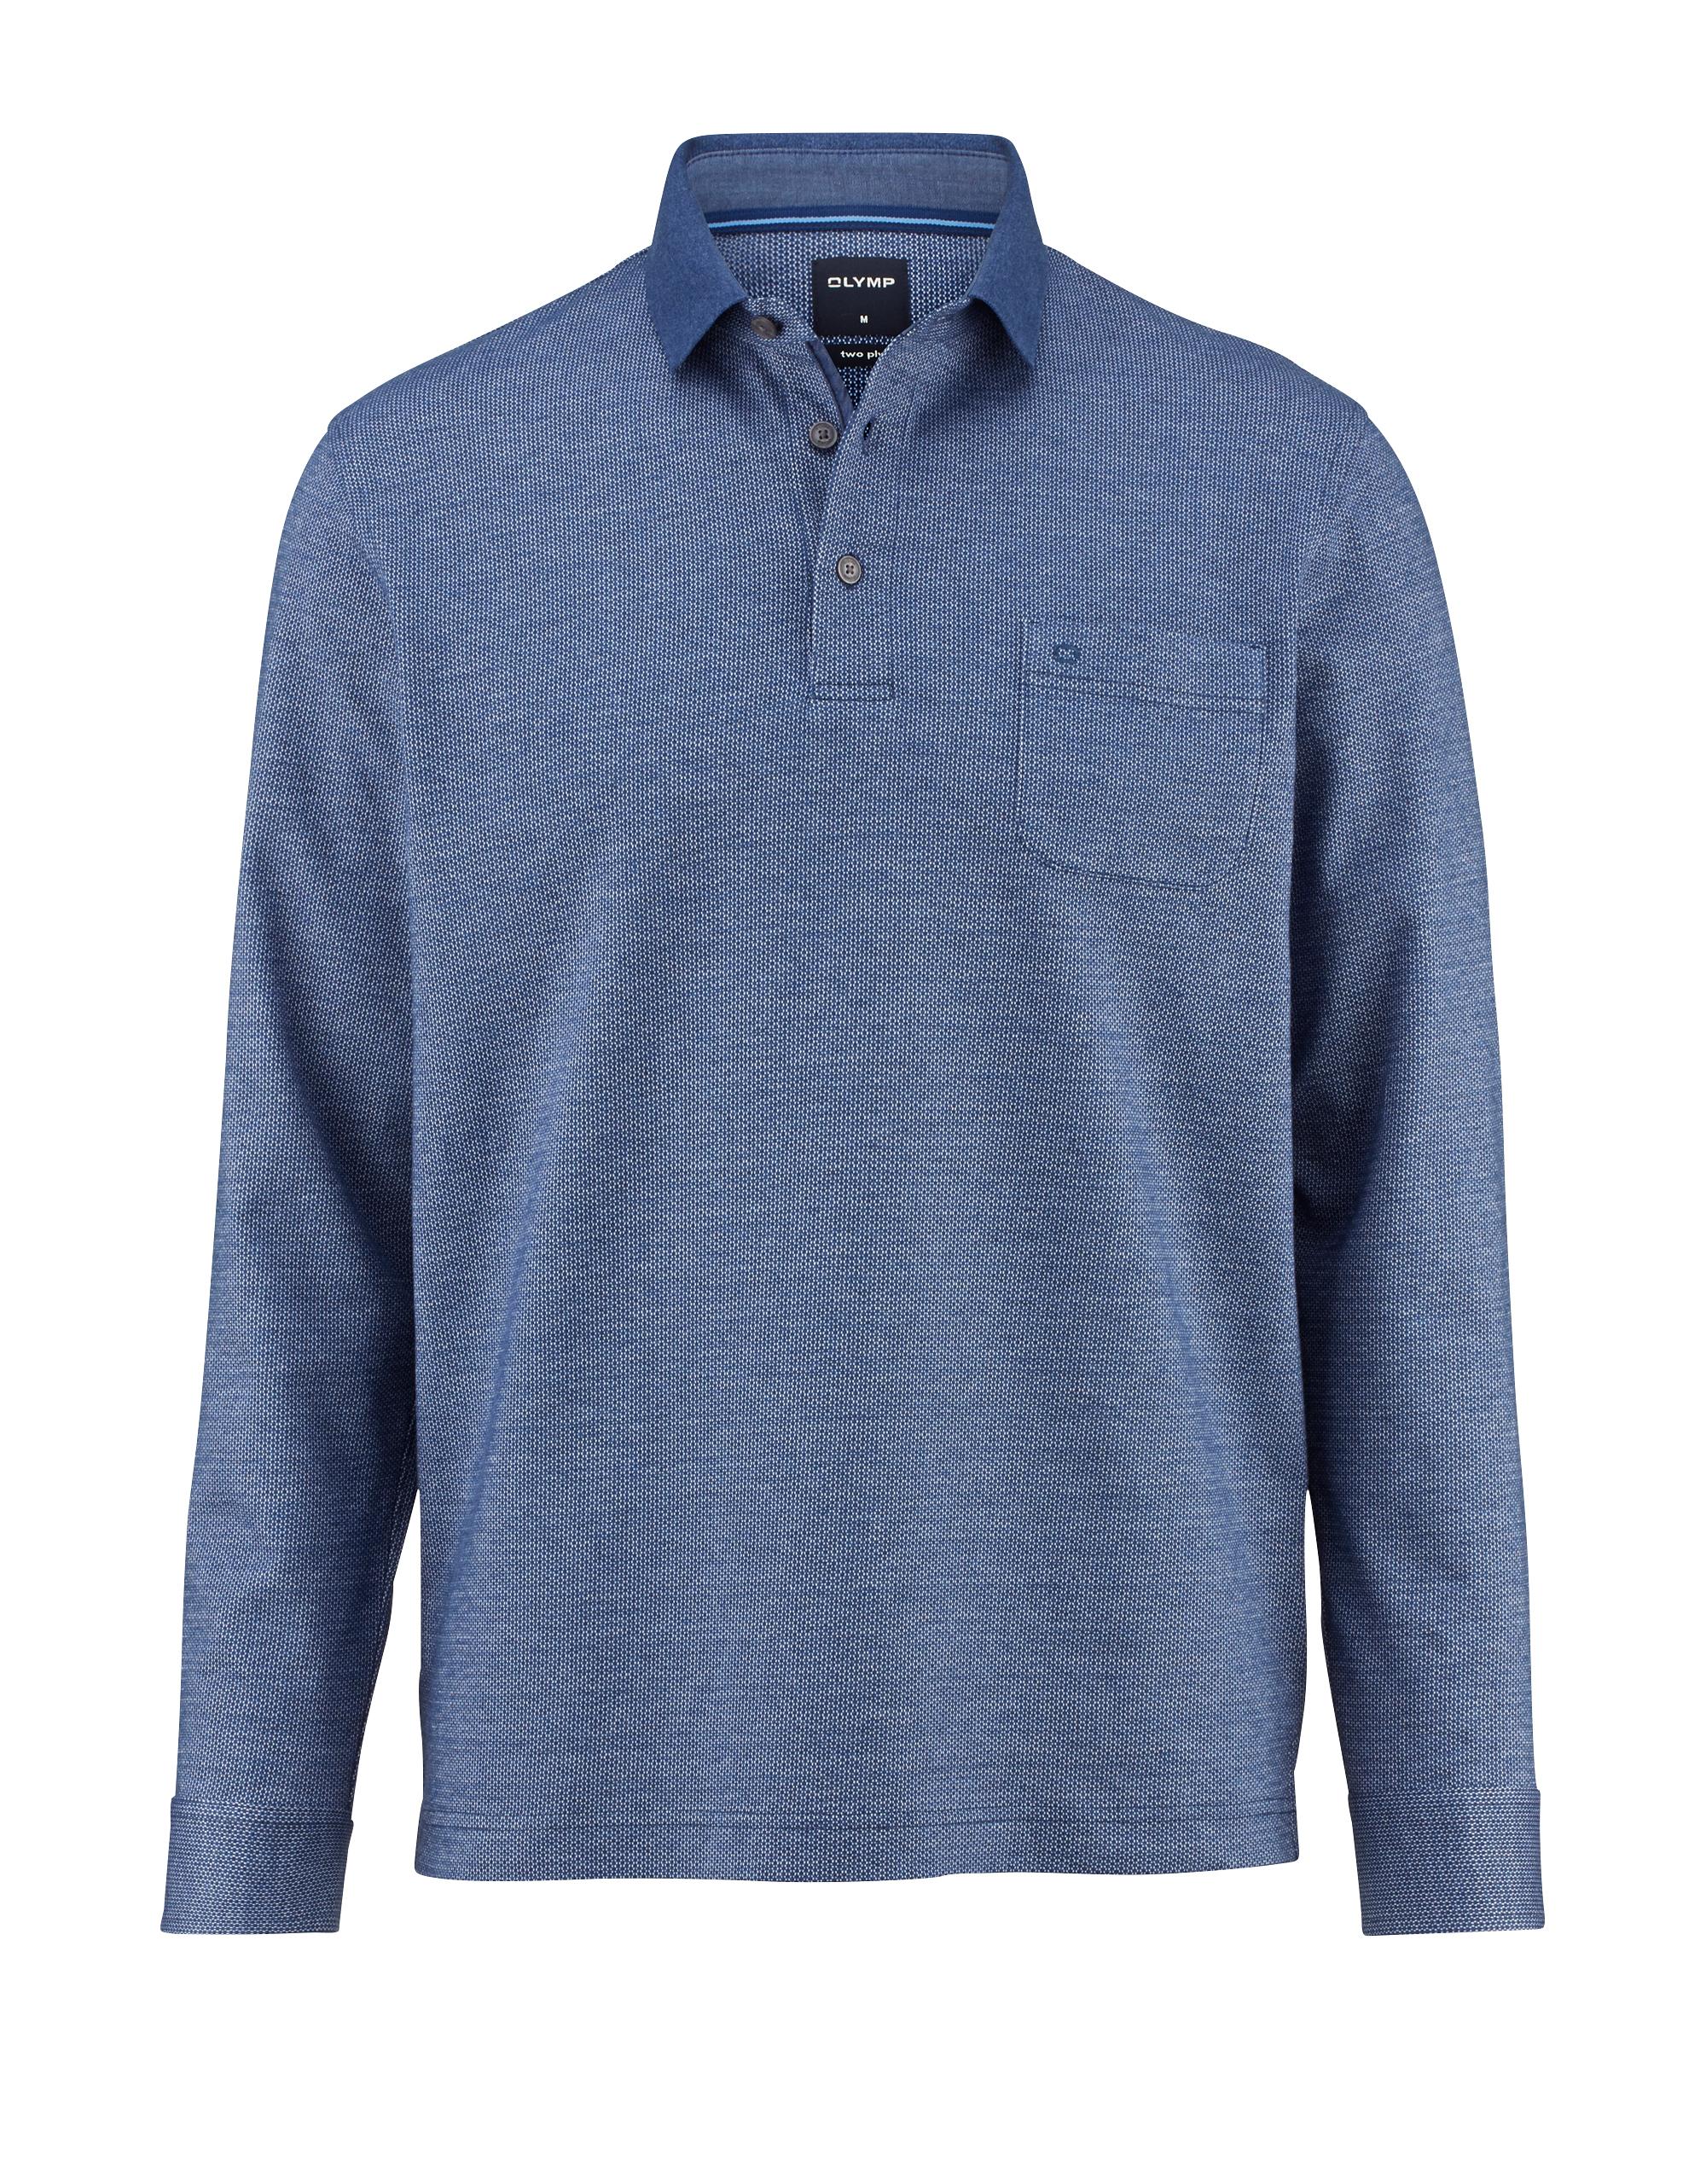 OLYMP Polo Pullover, modern fit, Blau, 3XL   Bekleidung > Pullover > Sonstige Pullover   Blau   100% baumwolle   OLYMP Polo